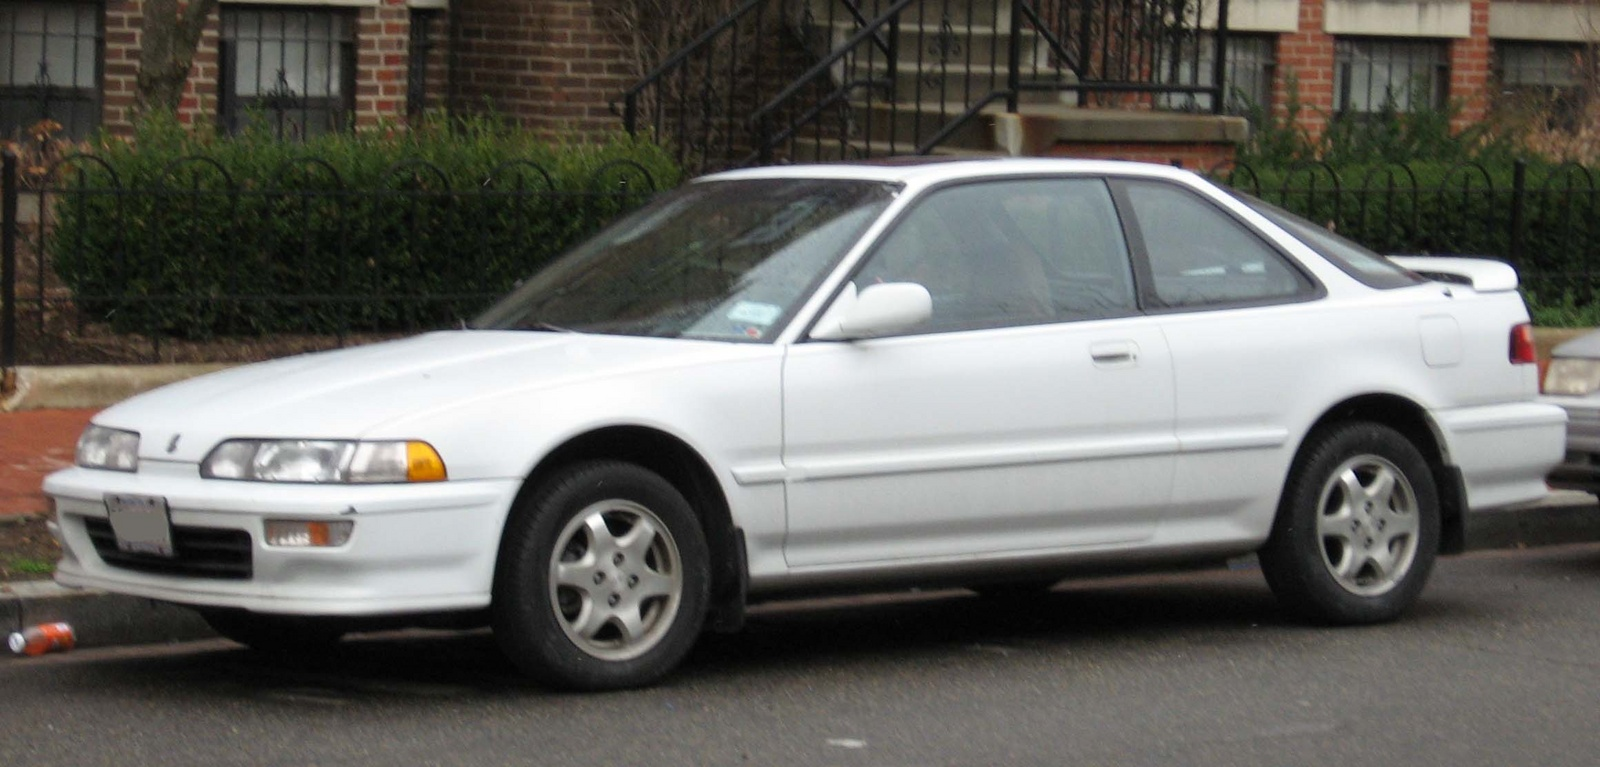 1993 Acura Integra 2 Dr Ls Hatchback Picture Exterior